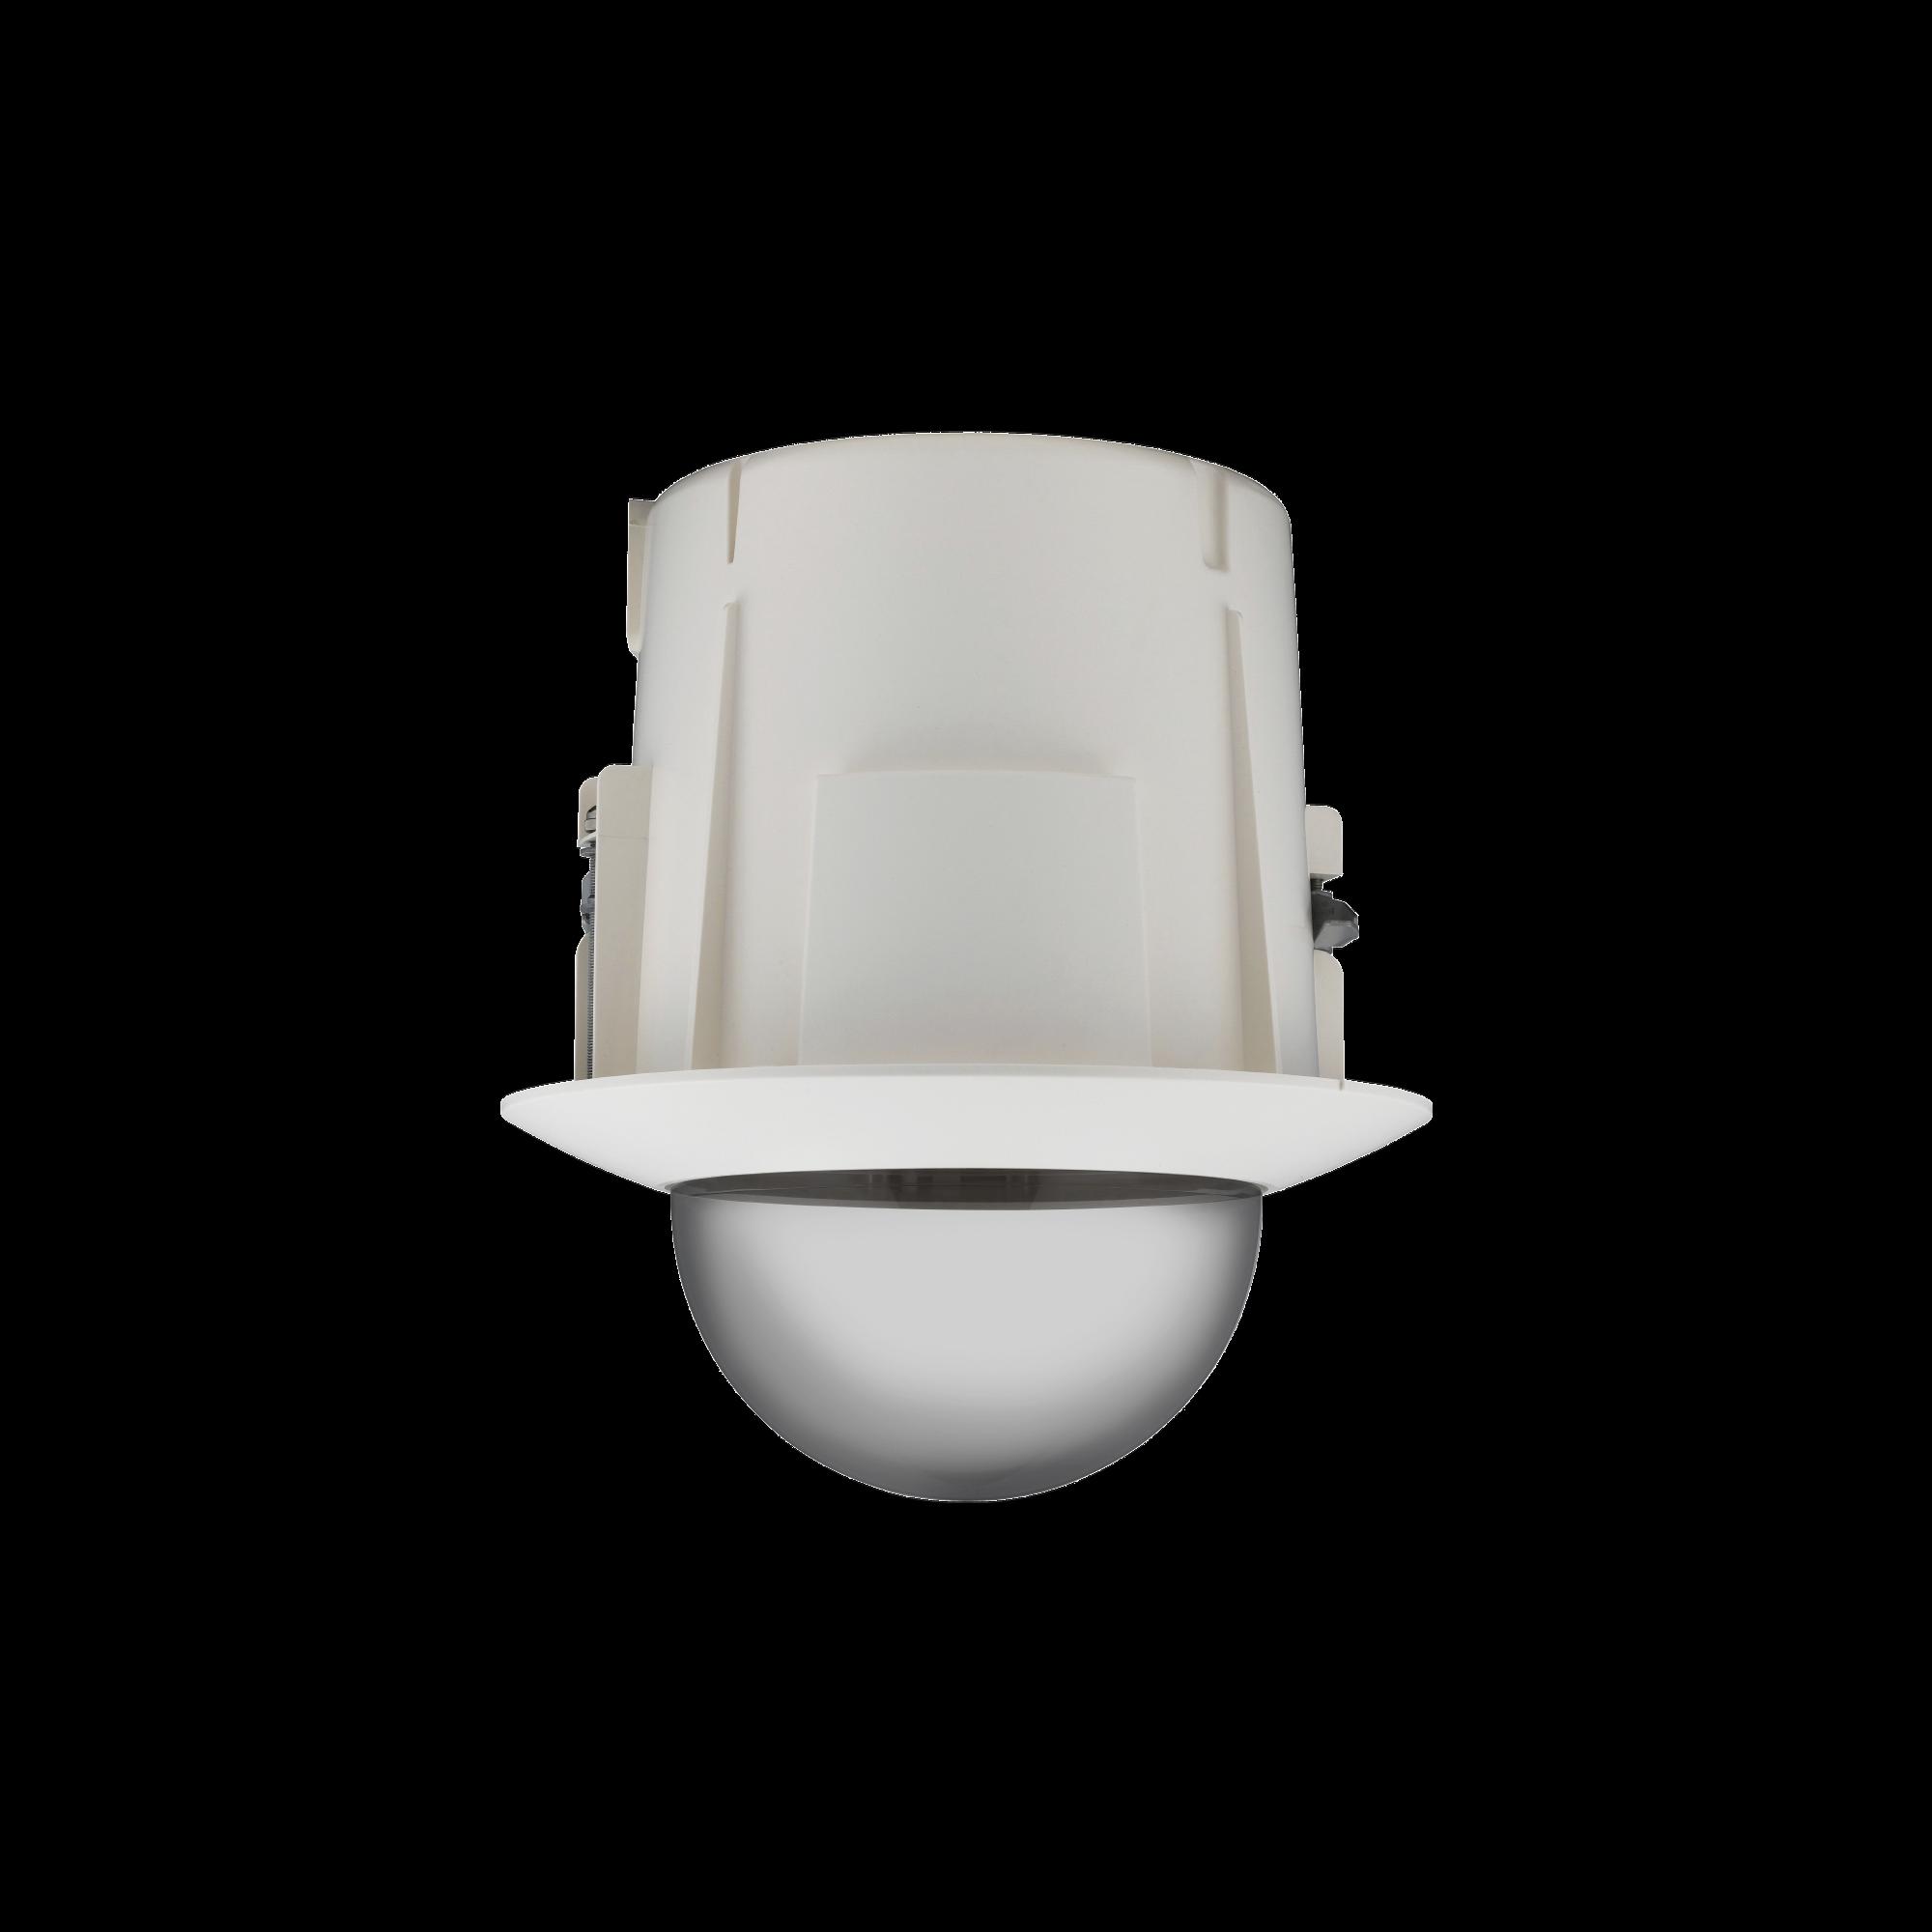 Montaje con Burbuja Ahumada para Cámaras PTZ XNP-6320 / QNP-6230 / HCP-6320A / HCP-6320